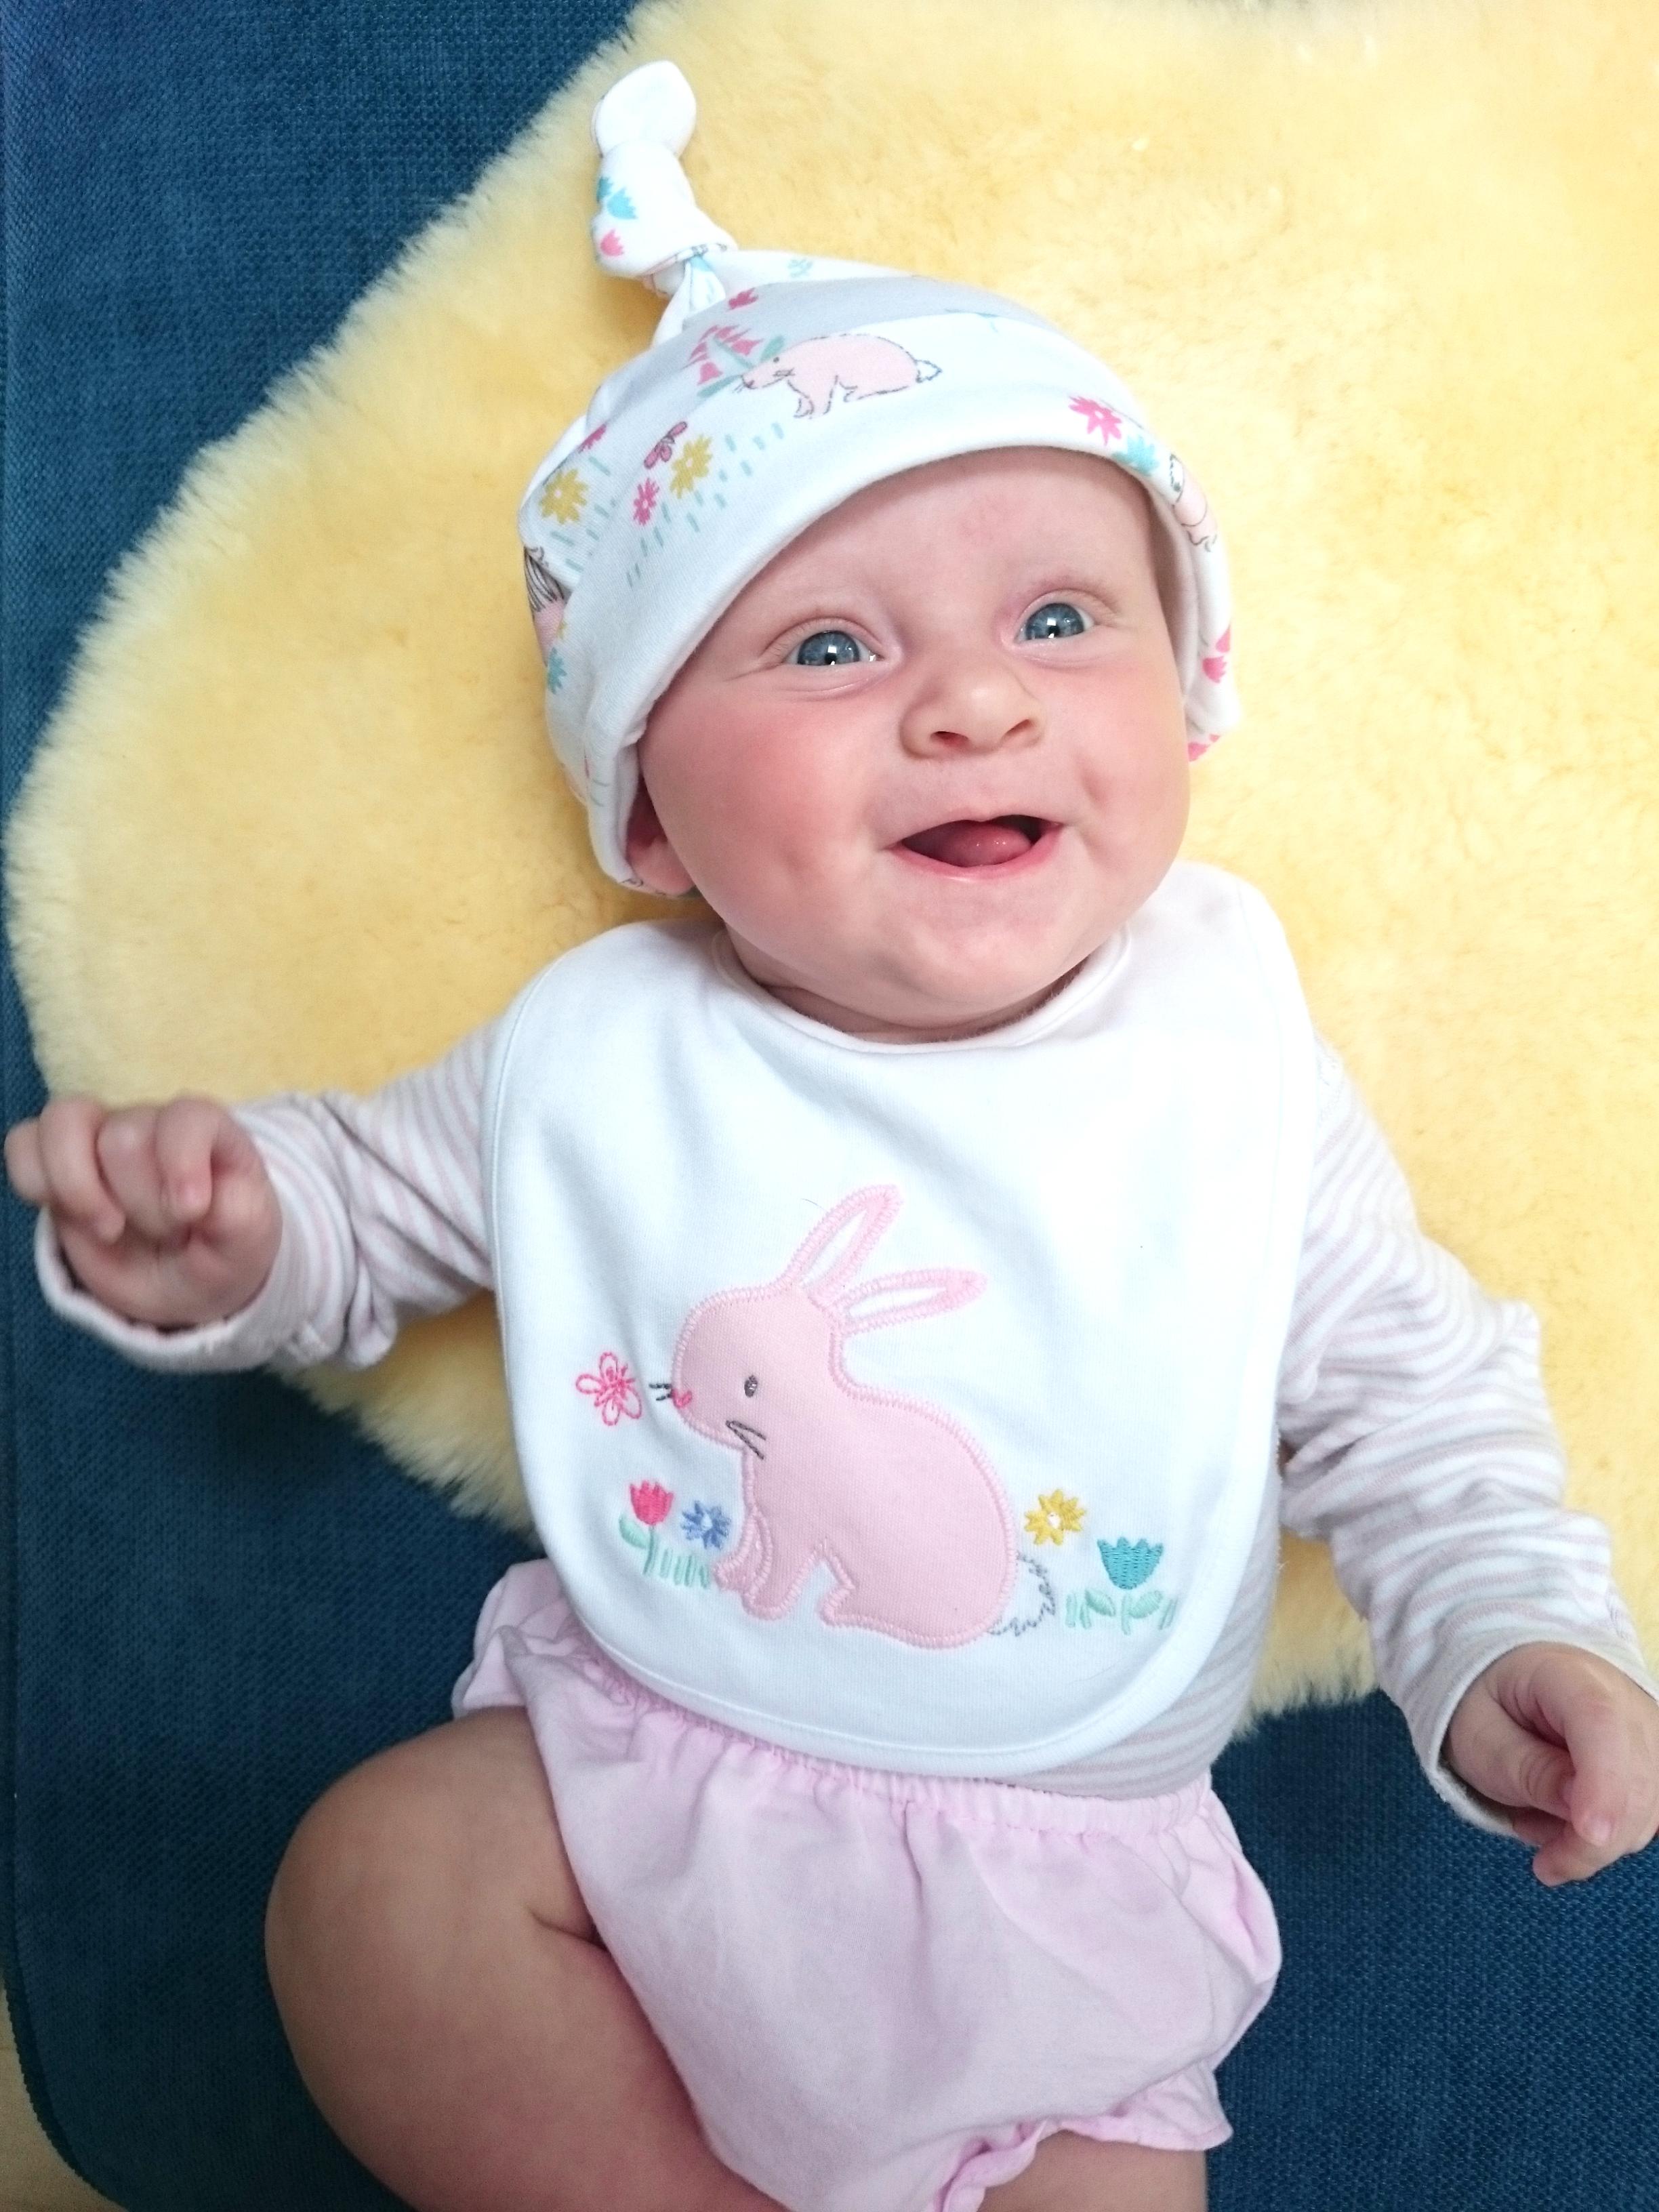 Evie smiling